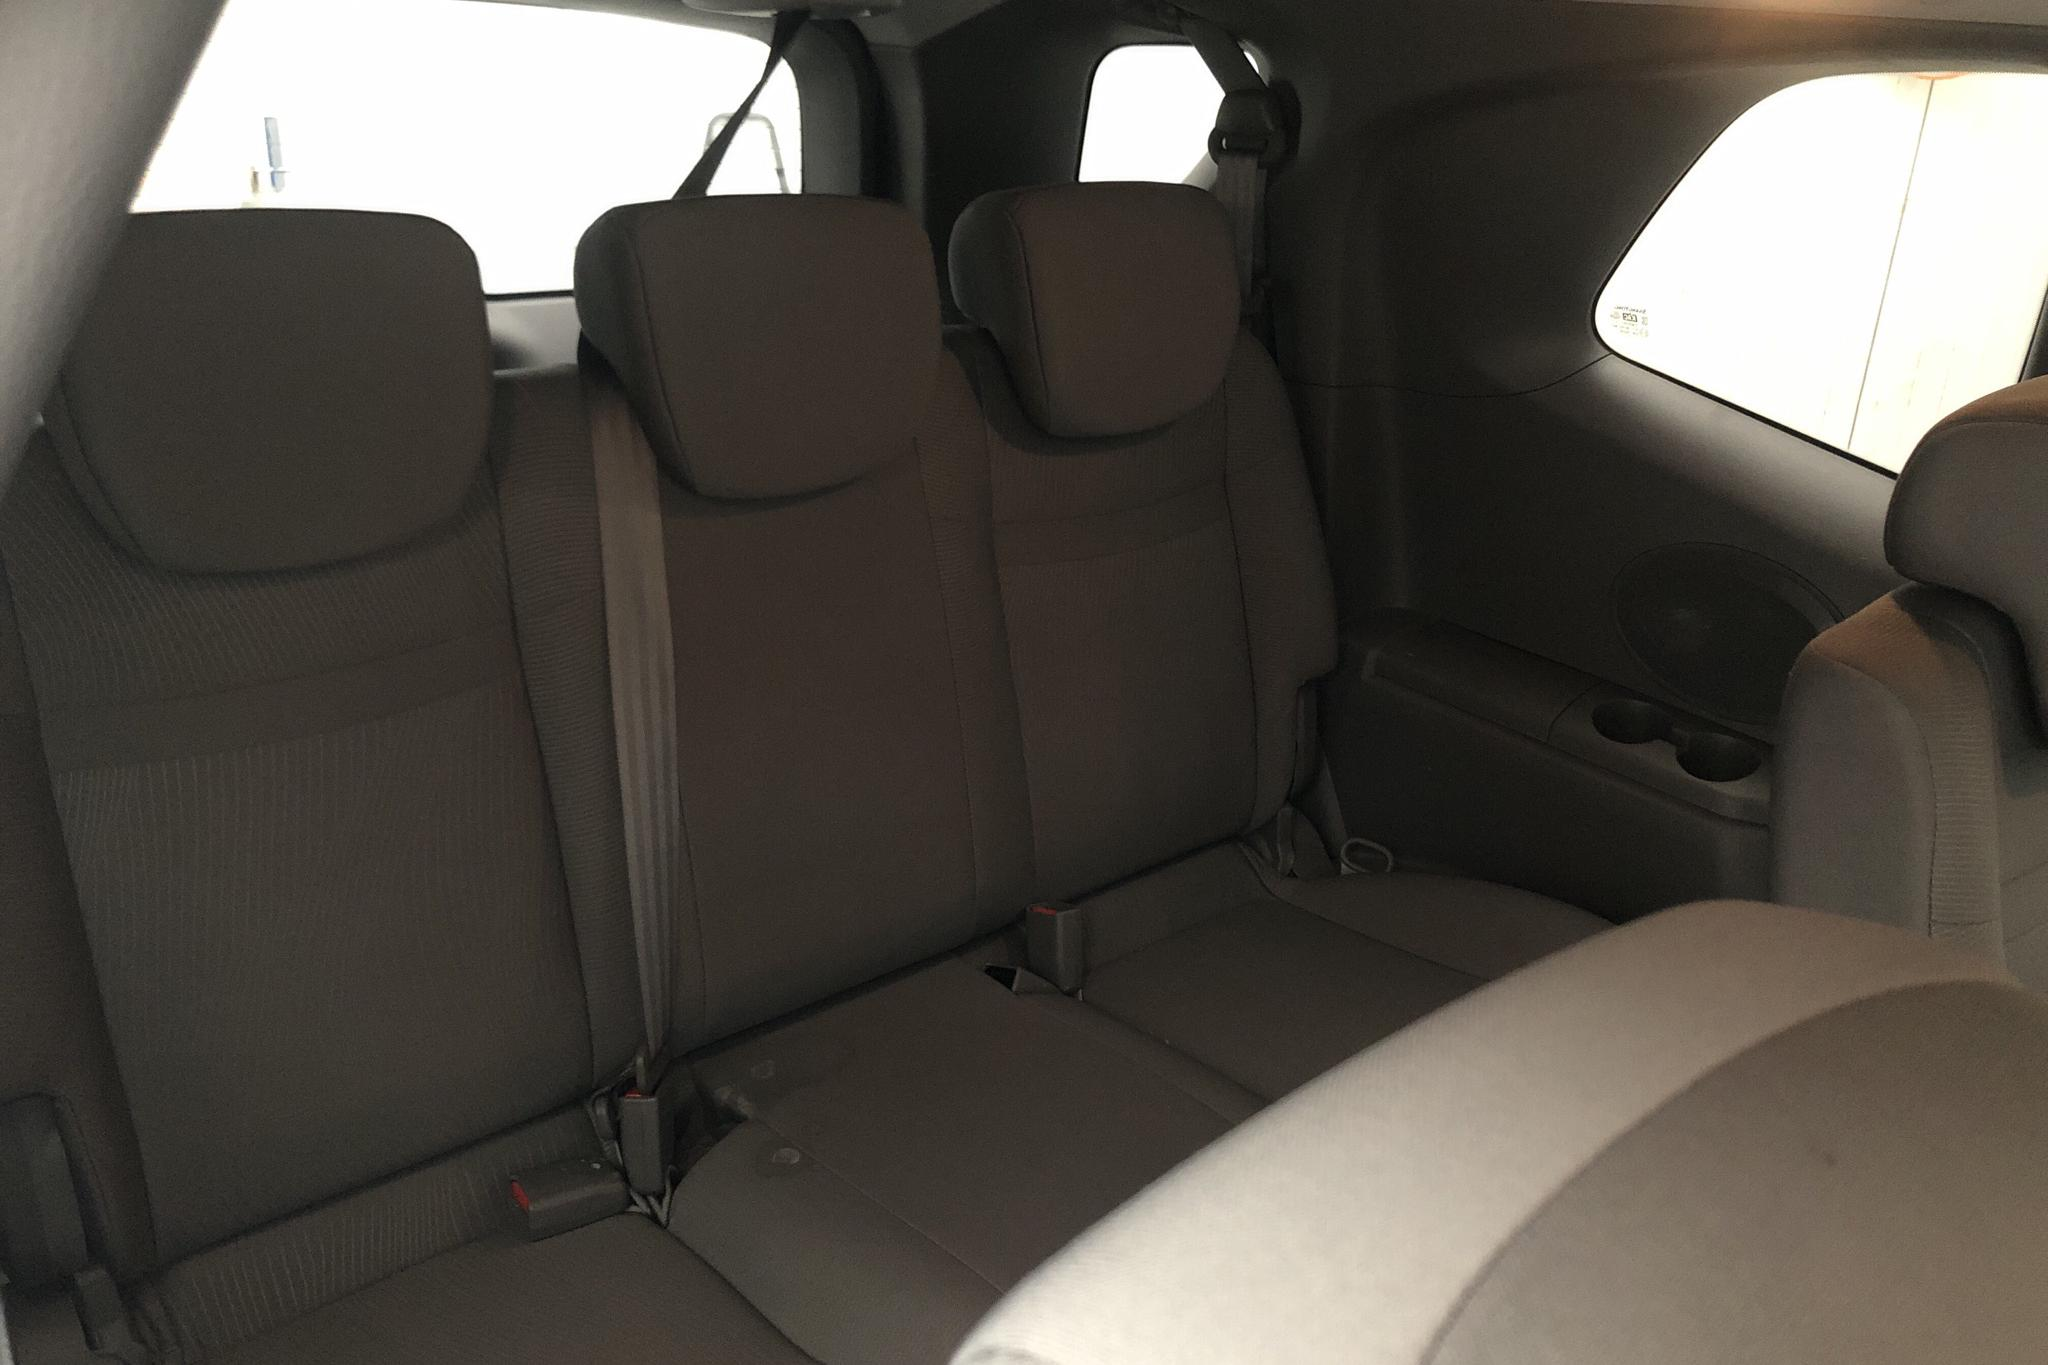 SsangYong Rodius 2.0 e-XDi 4WD (155hk) - 46 550 km - Automatic - silver - 2013